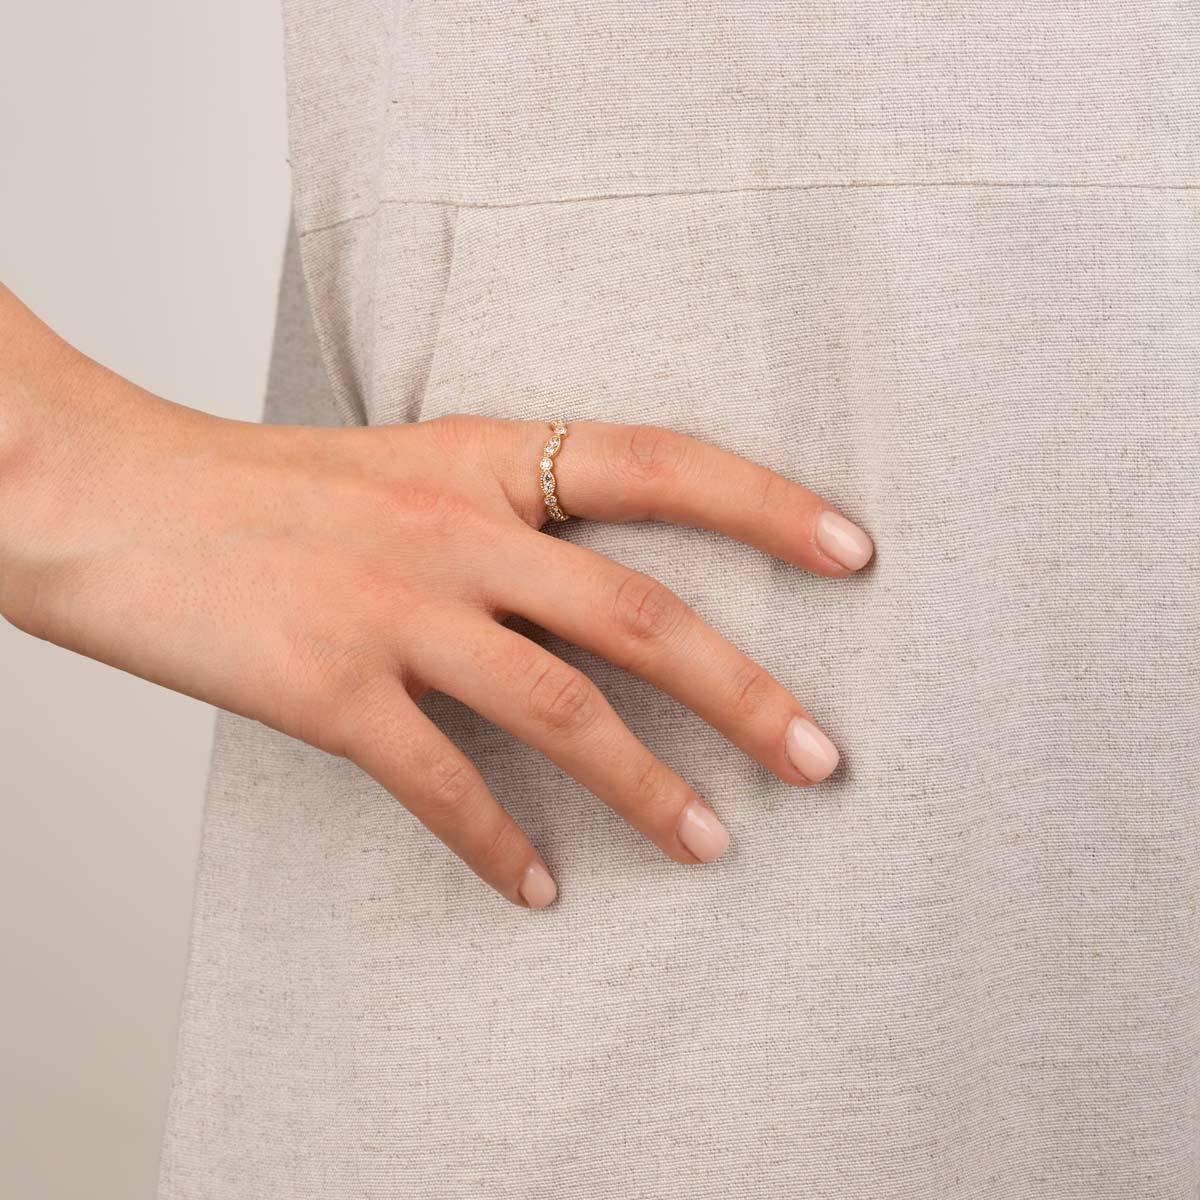 انگشتر طلا دورنگین مارکیز و لونا